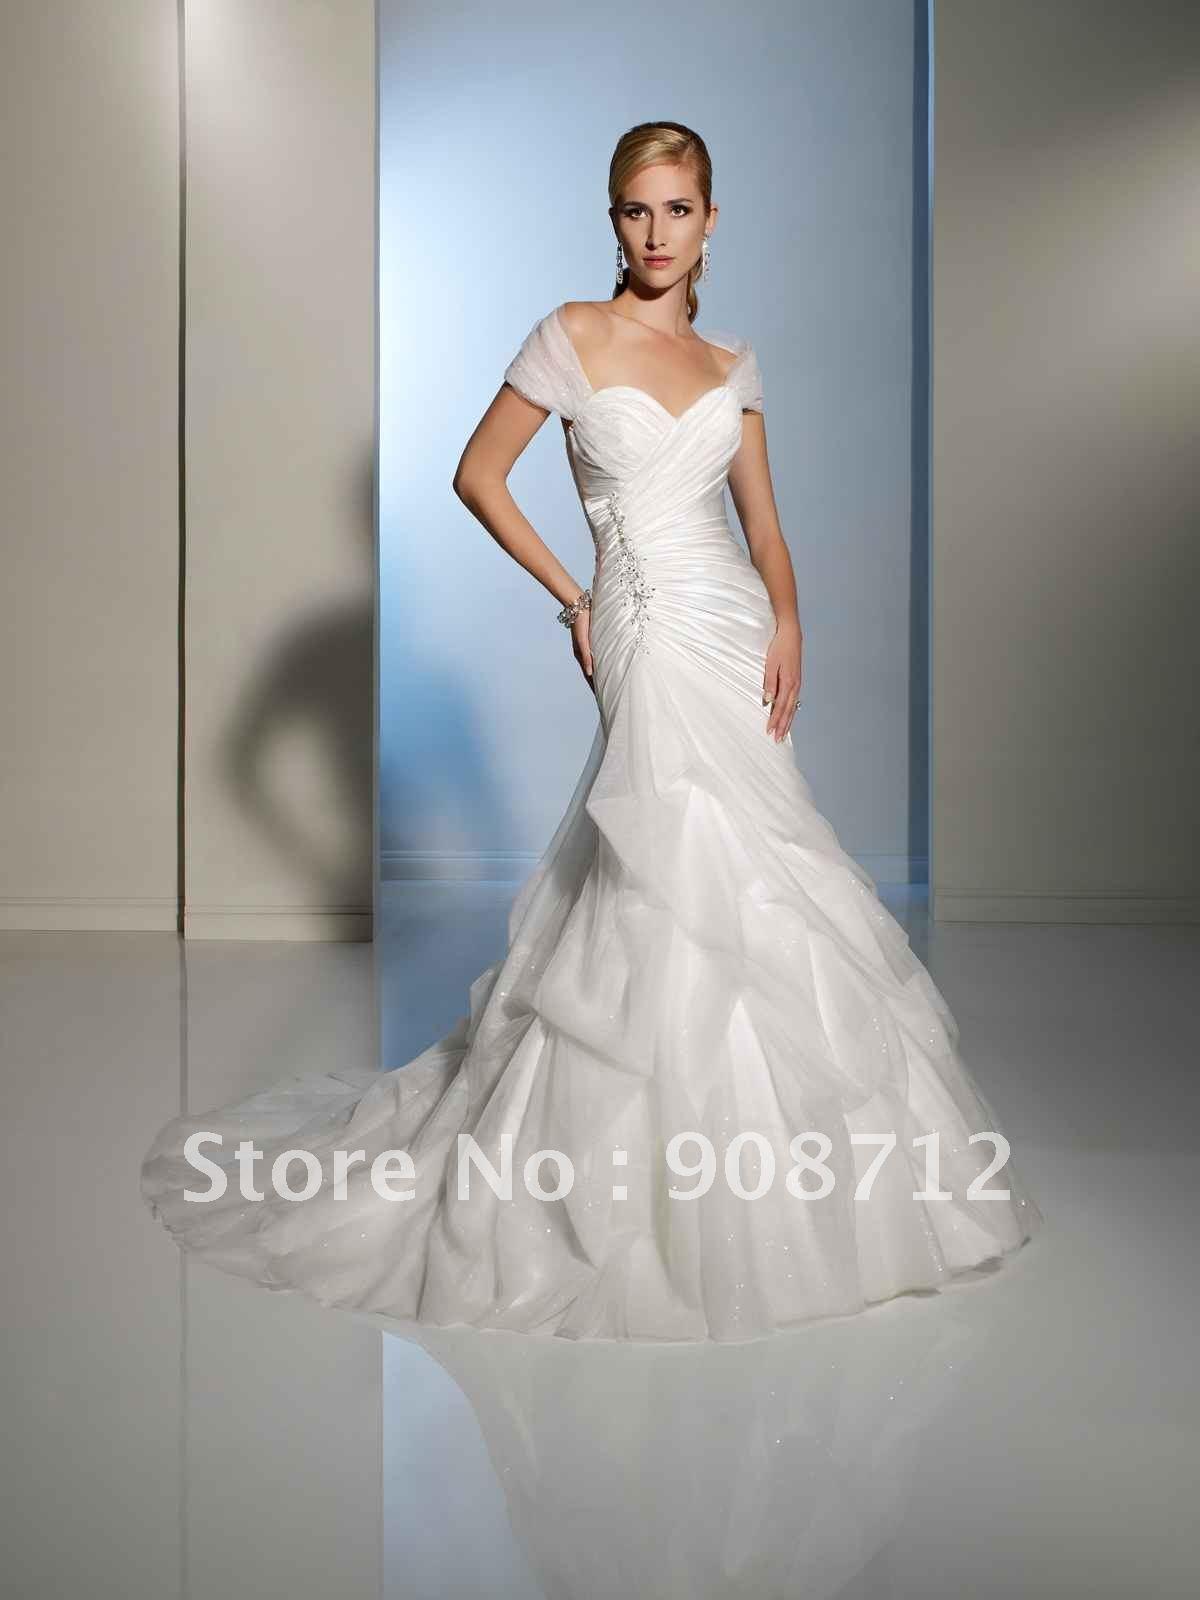 2013 style satin and diamond tulle slim A line wedding